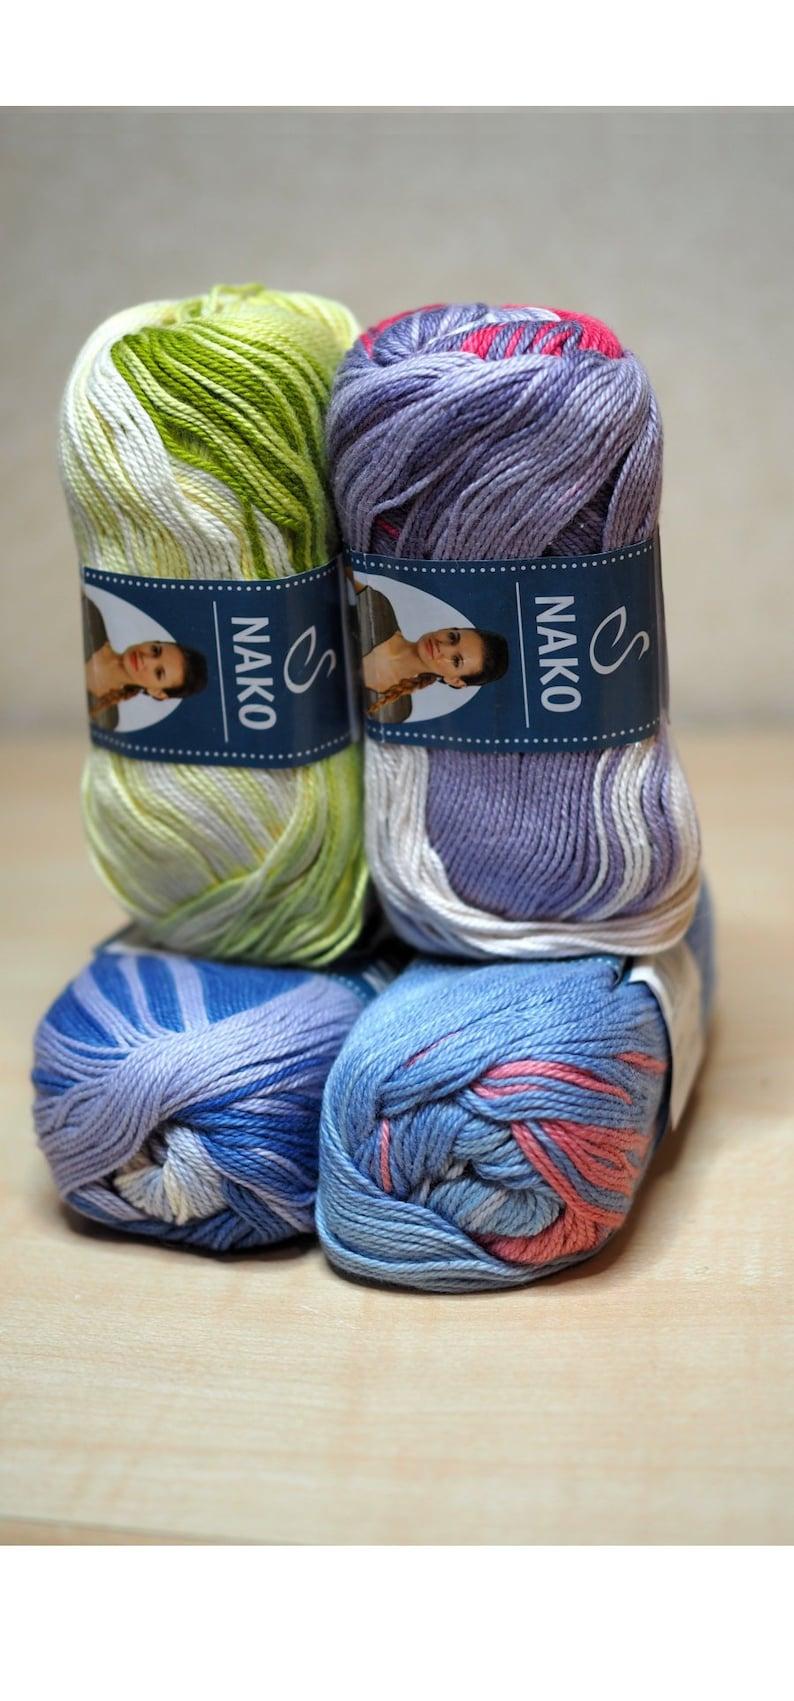 7ada5d4788d2c 100% Cotton Nako Gentle striped yarn hand knit multicolour   Etsy